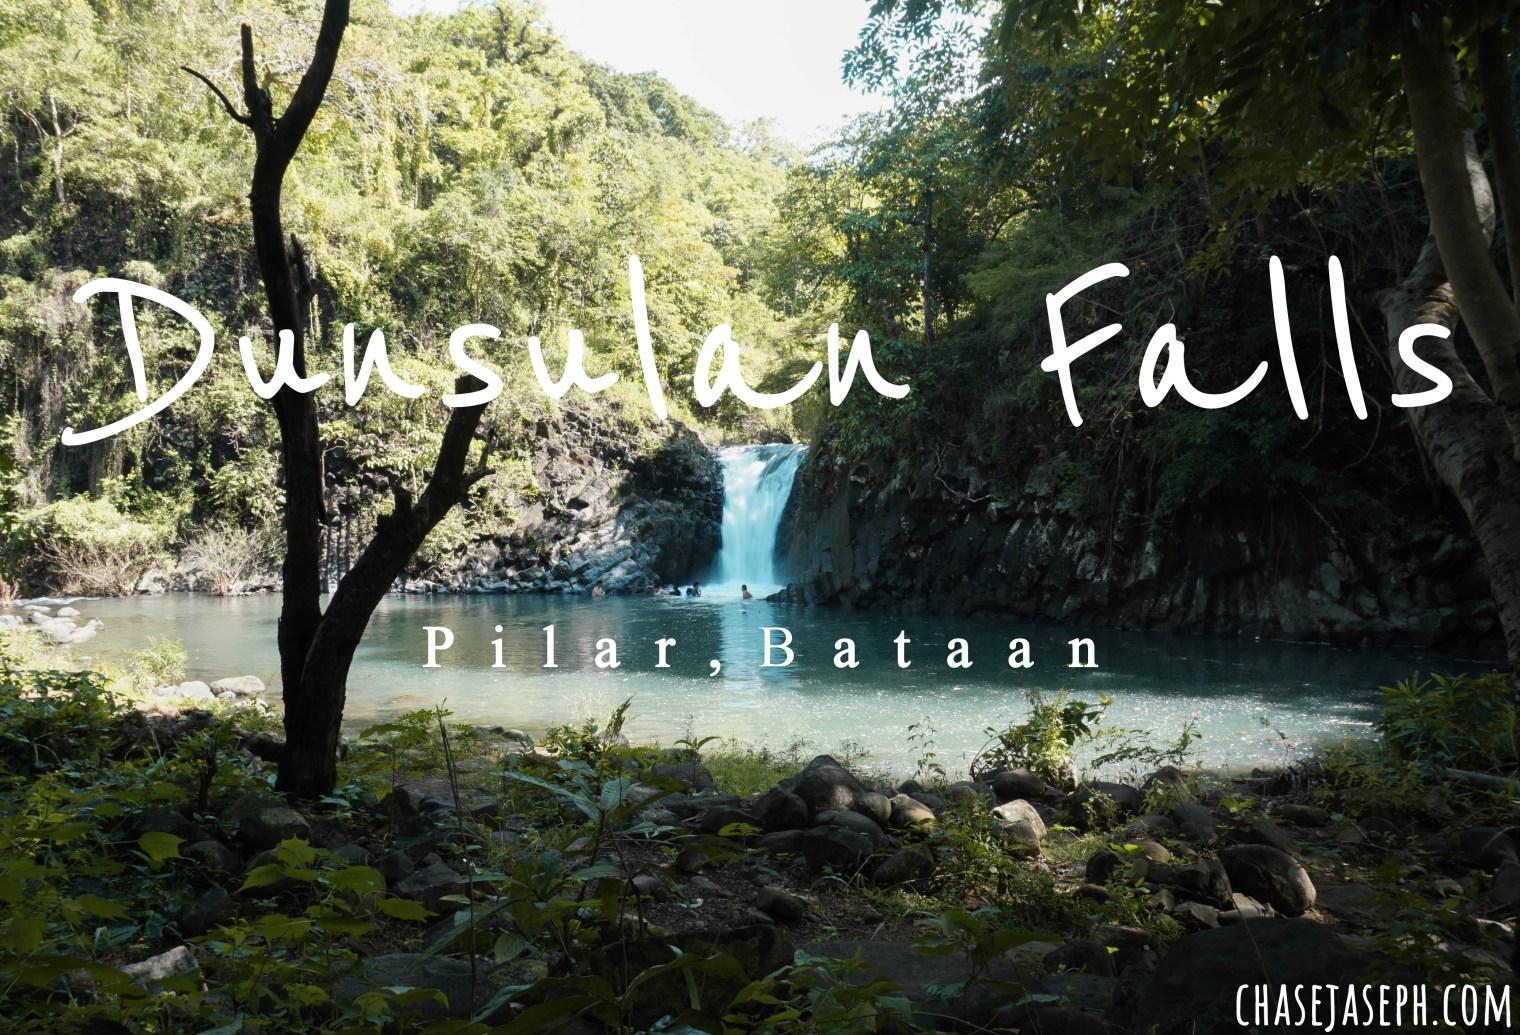 Dunsulan Falls - Pilar, Bataan (Travel Guide)